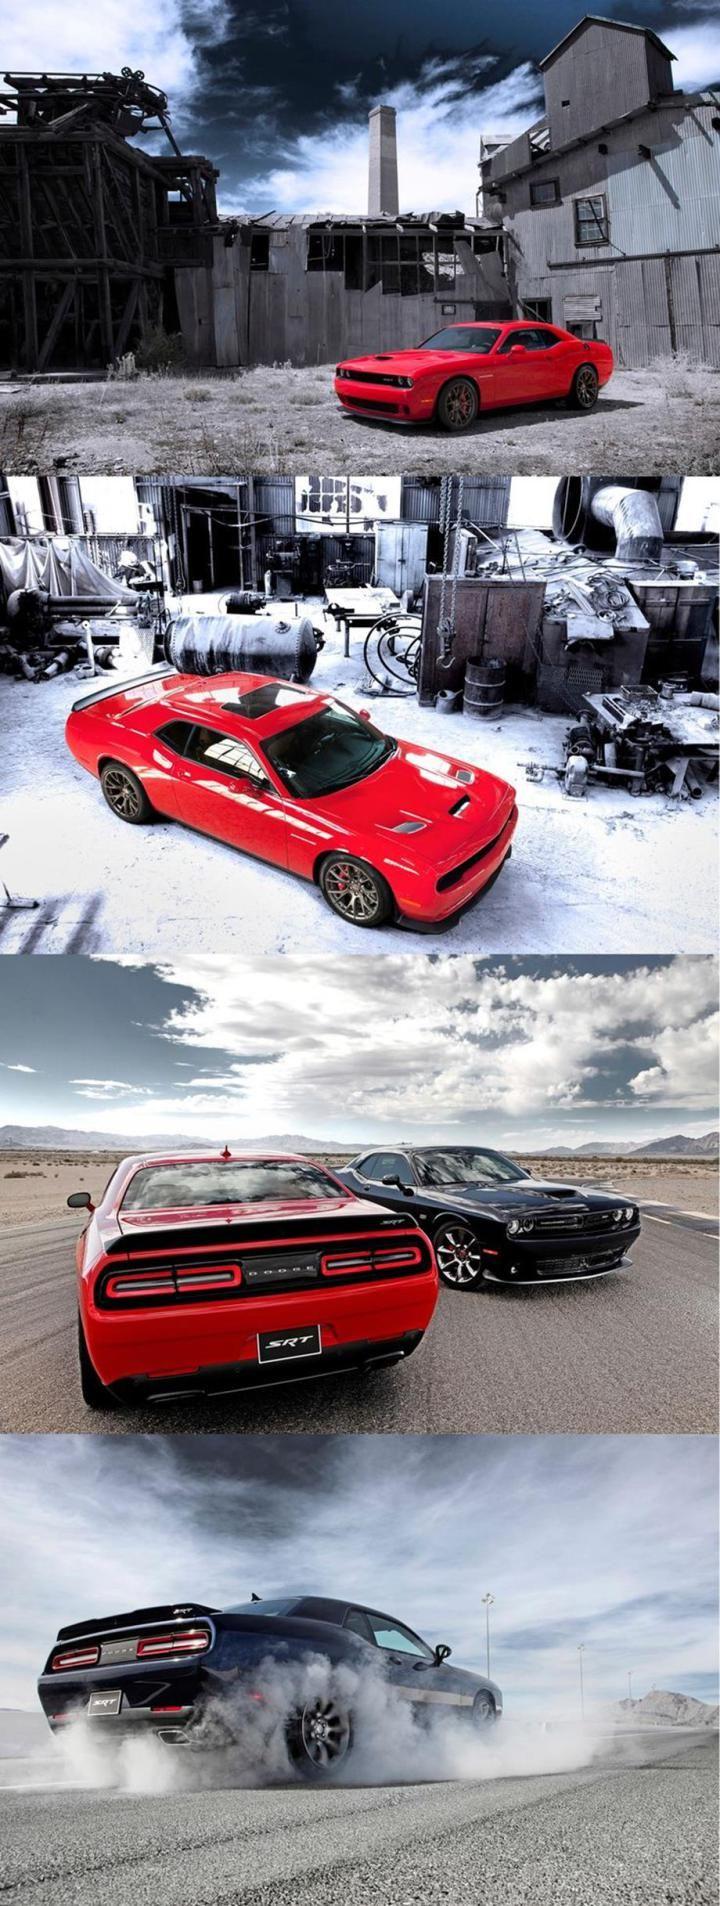 Dodge Challenger STR Hellcat Price Sale Accessories Dealership Insurance 32